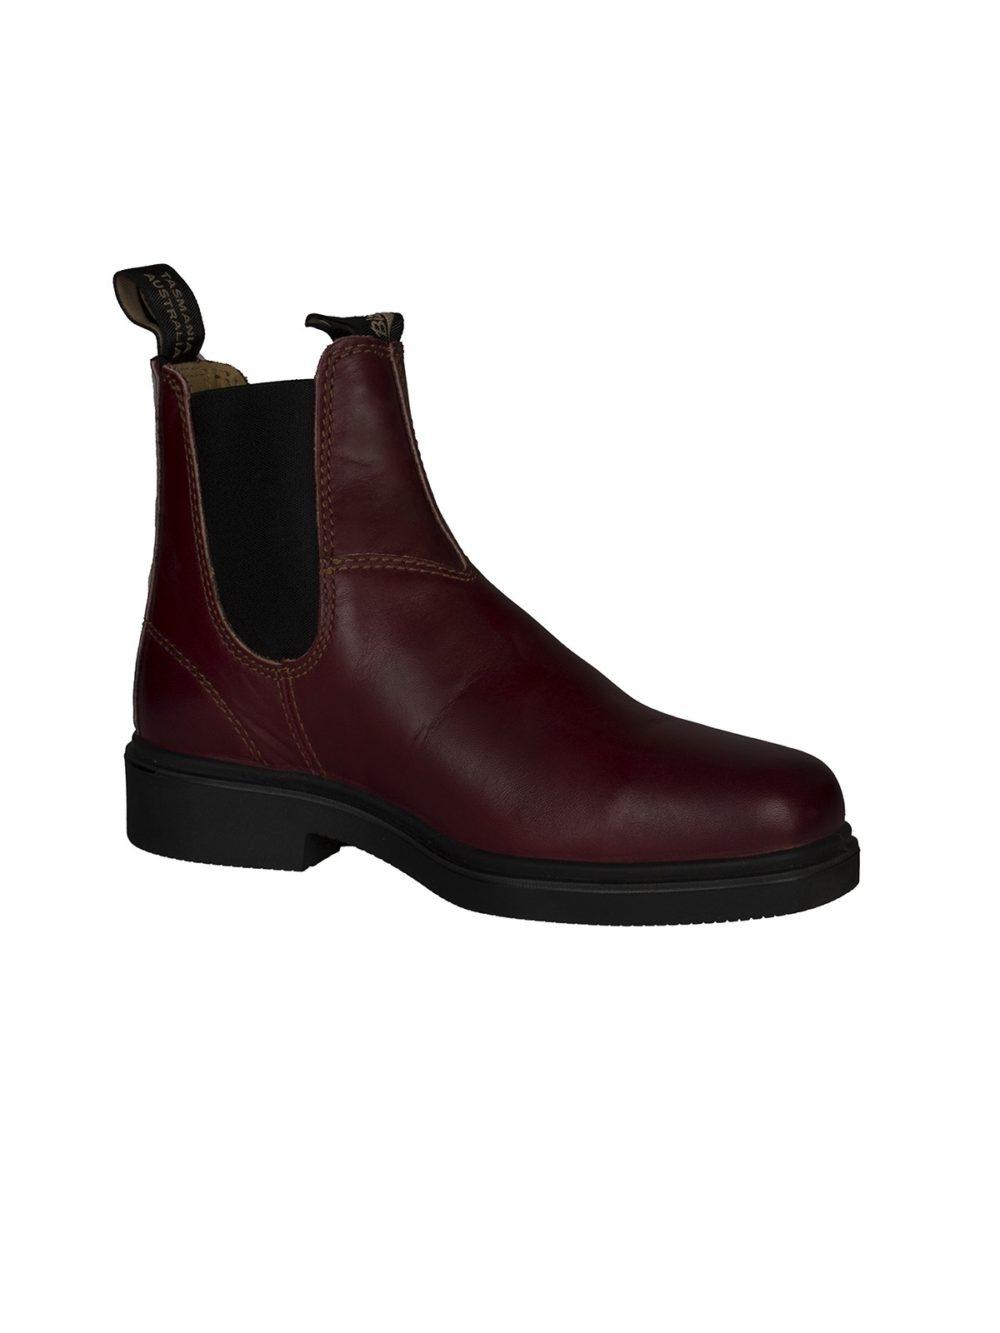 Chelsea Boot Burgundy 1302